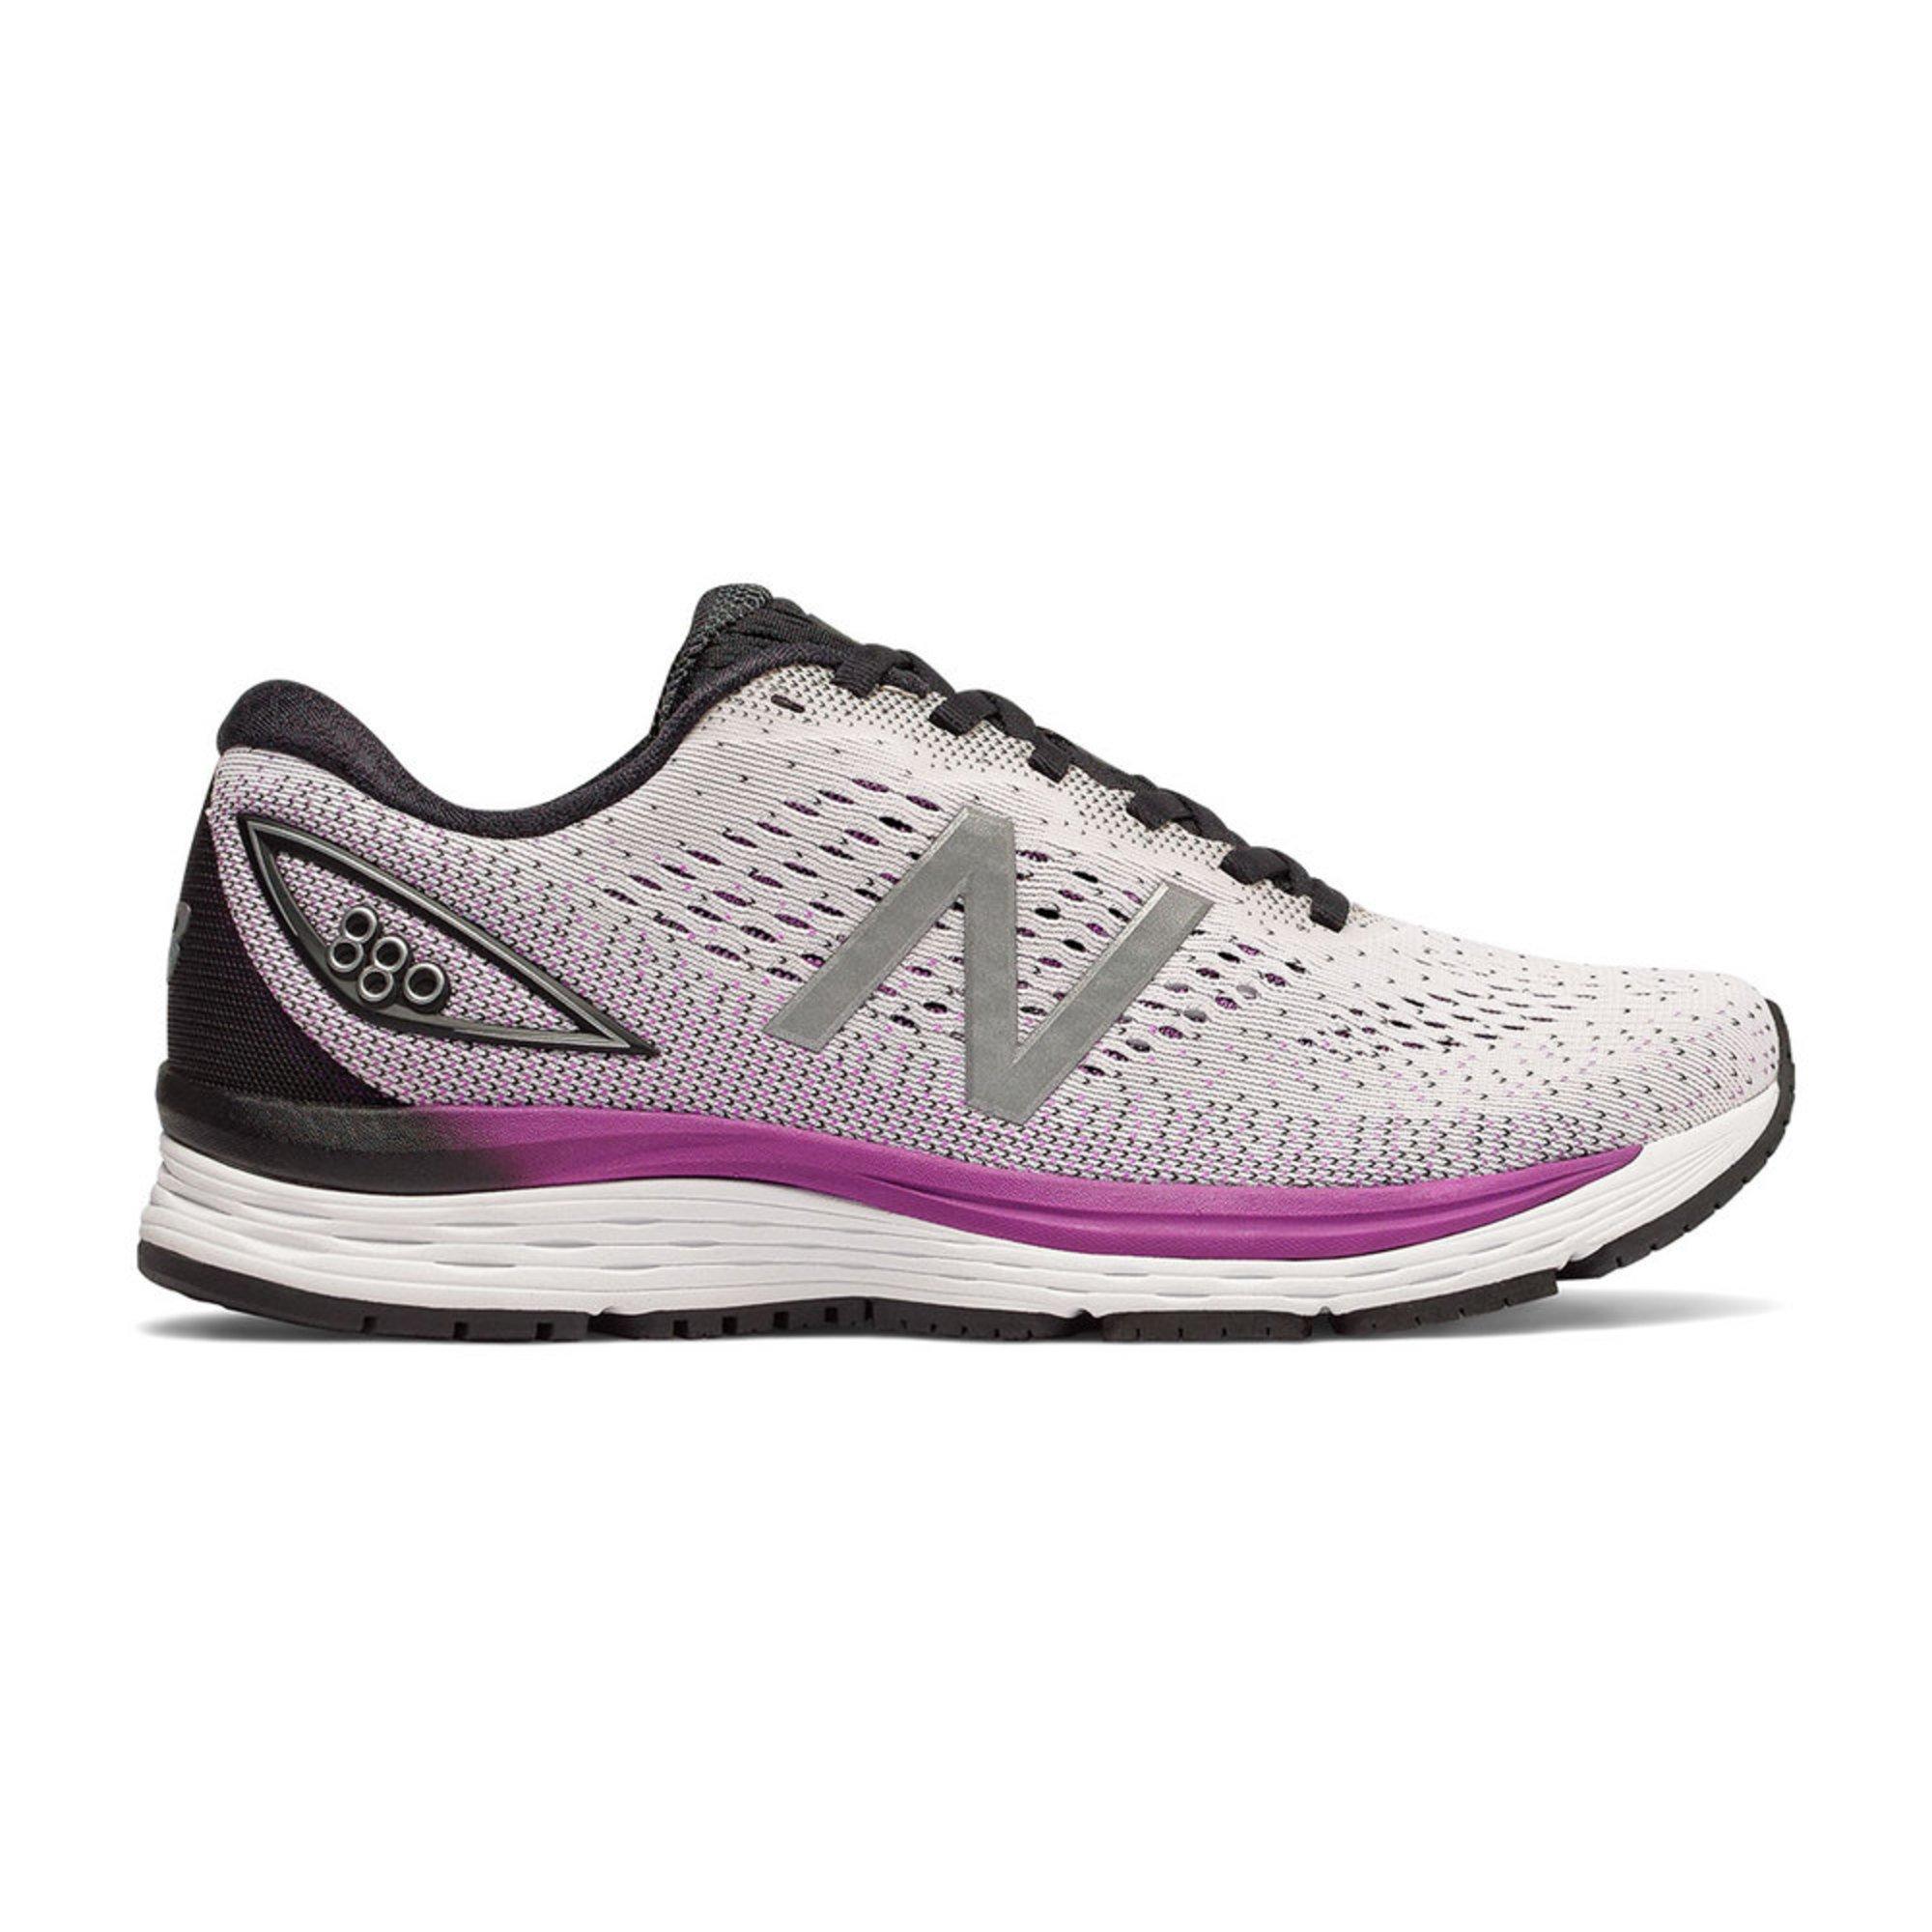 New Balance Women's 880v9 Running Shoe | Women's Running